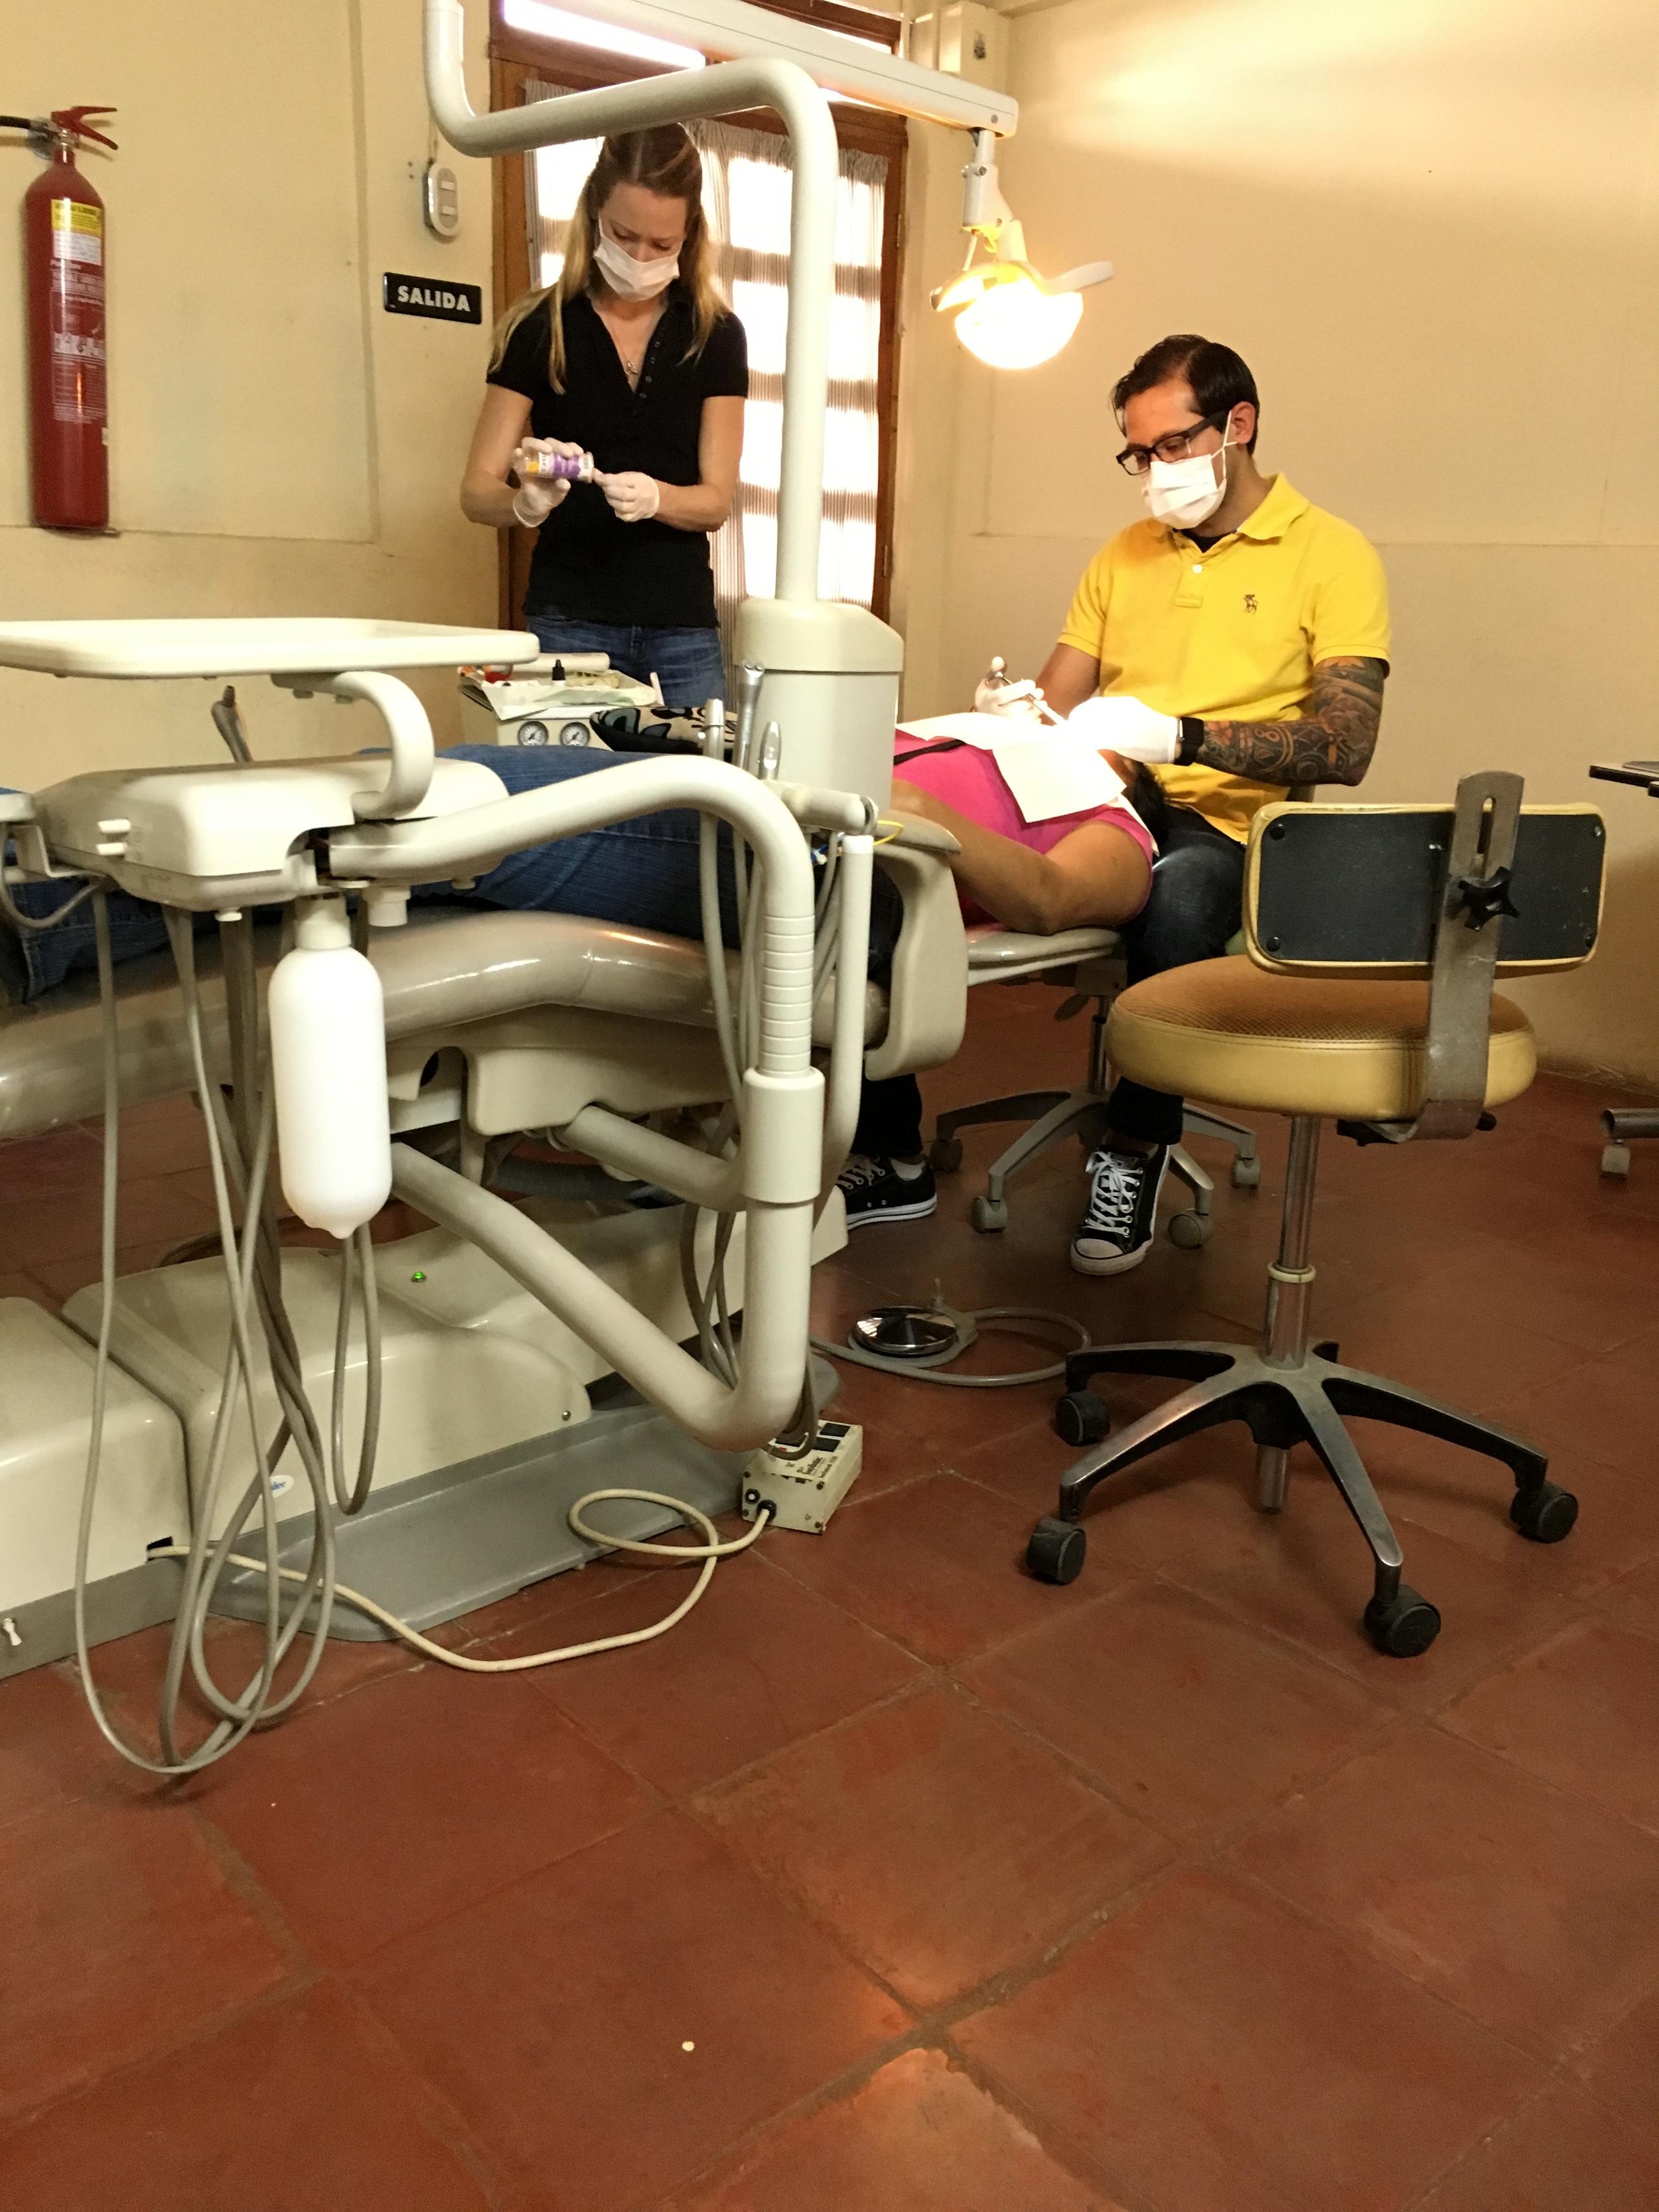 Oscar and Rebekah Gonzalez providing dental care in Nicaragua